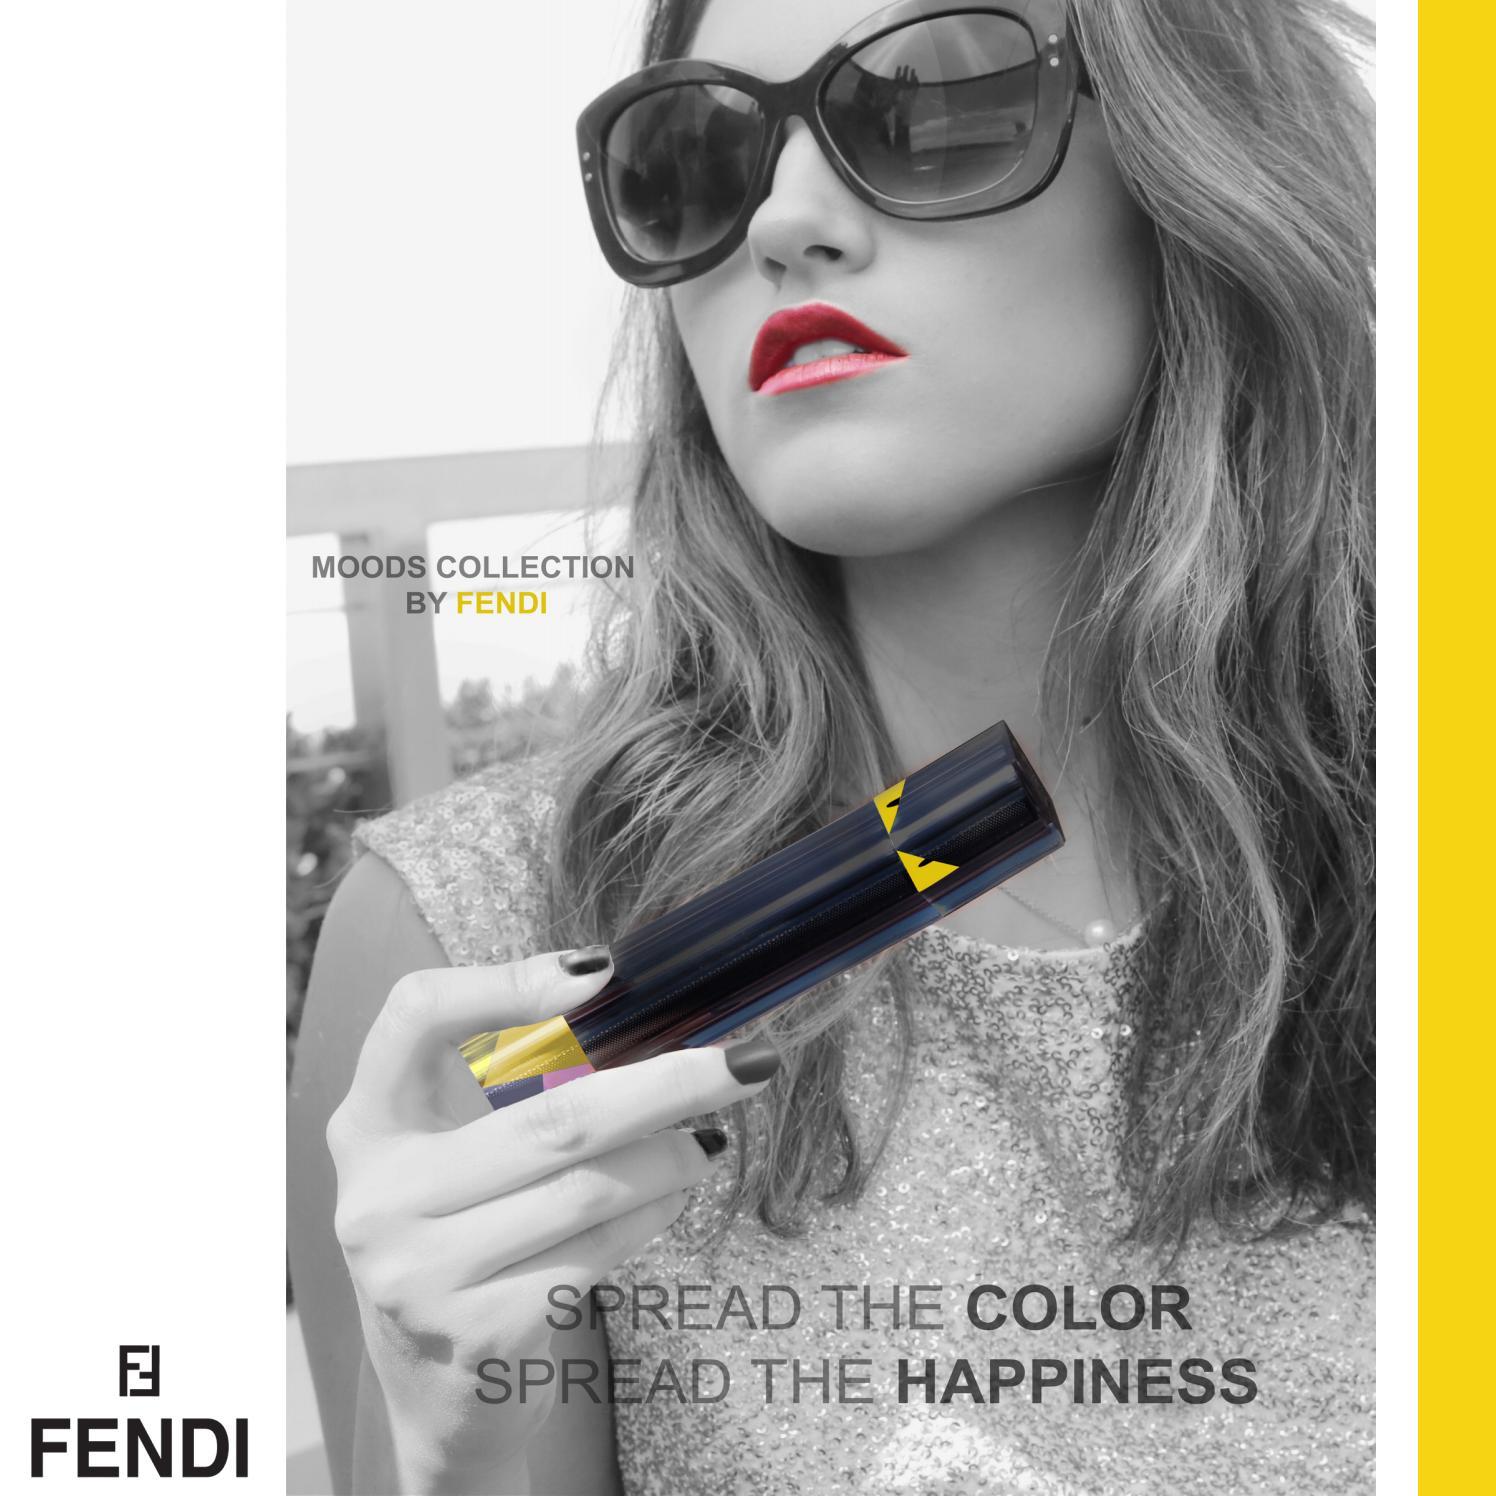 06bbcafb9413 FENDI - IMC Plan by Rutuja Mahajan - issuu